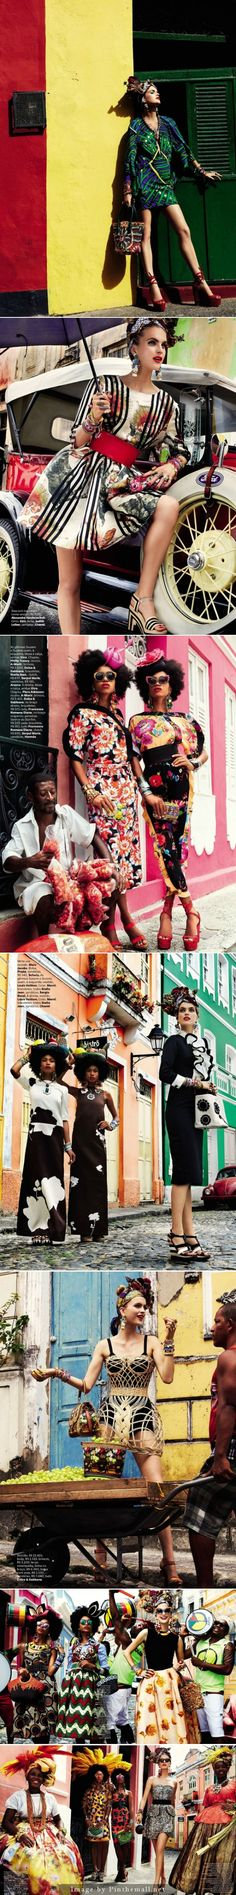 Carmen Miranda Reloaded editorial red yellow wall in Vogue Brazil February 2013 with Mirte Maas, Suzane & Suzana.